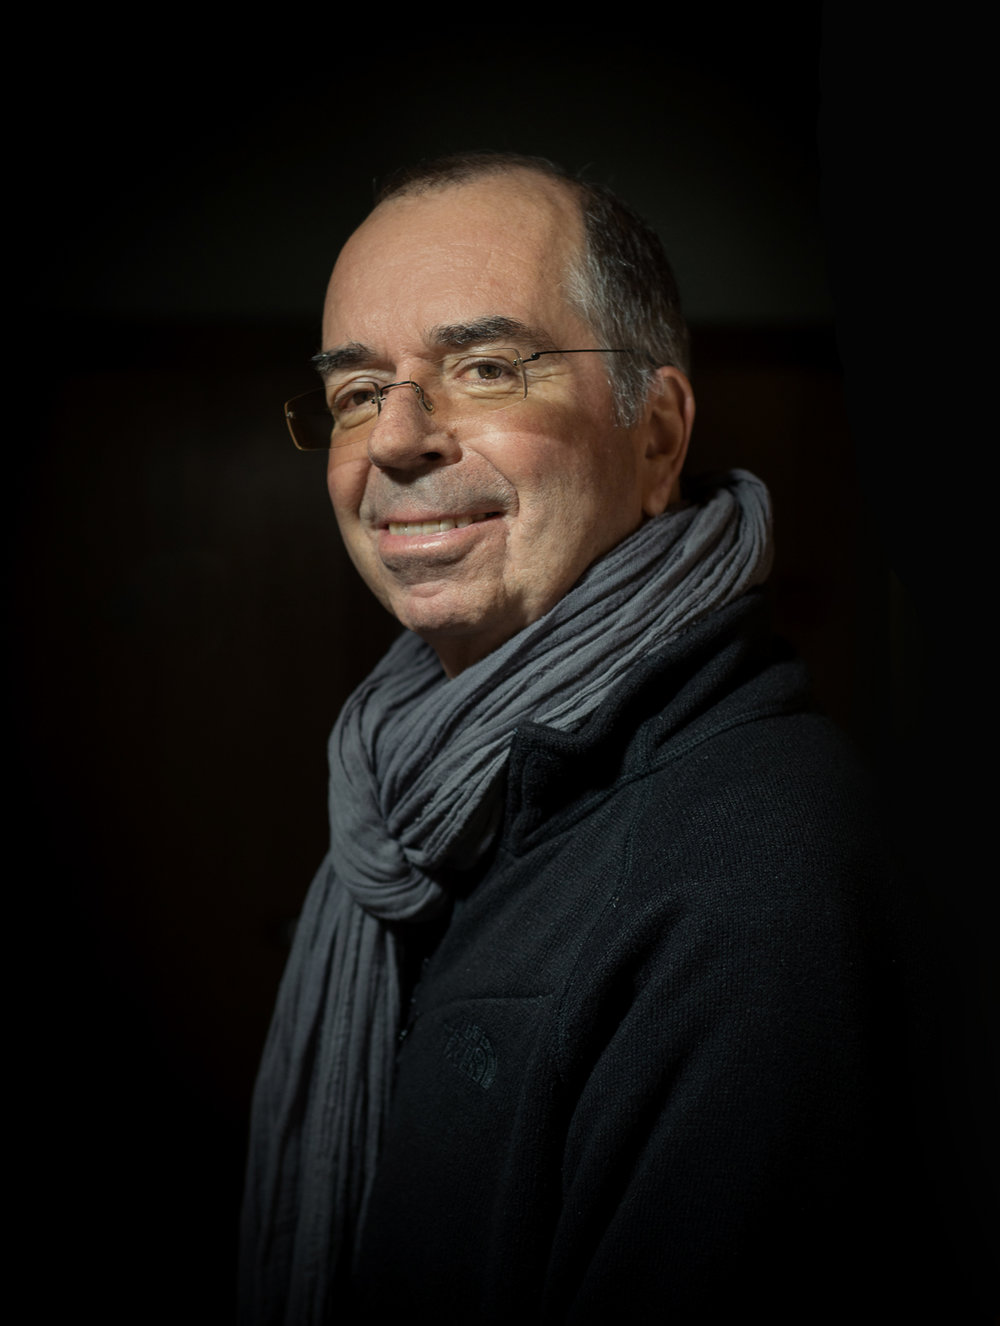 Novelist Jan Kjærstad